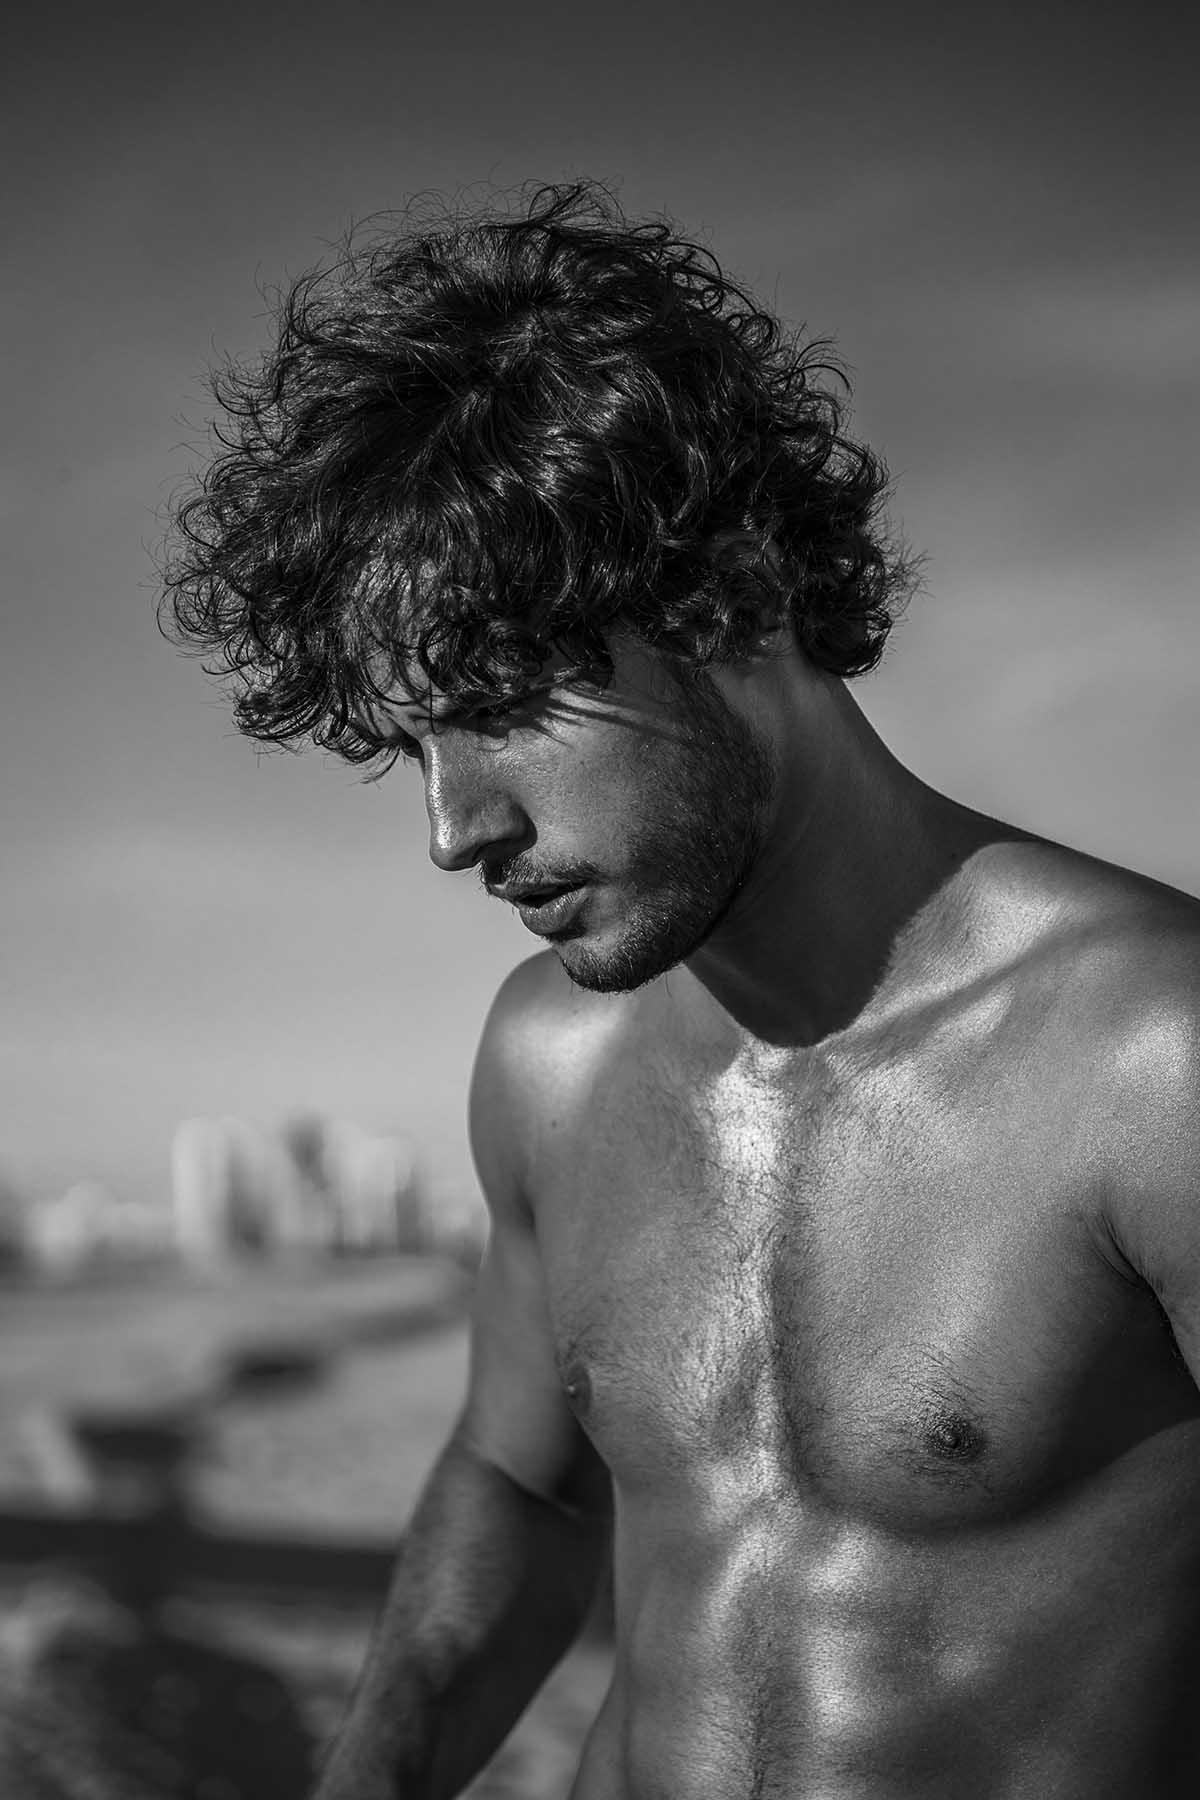 Rodrigo Lopes by Luiz Moreira for Brazilian Male Model